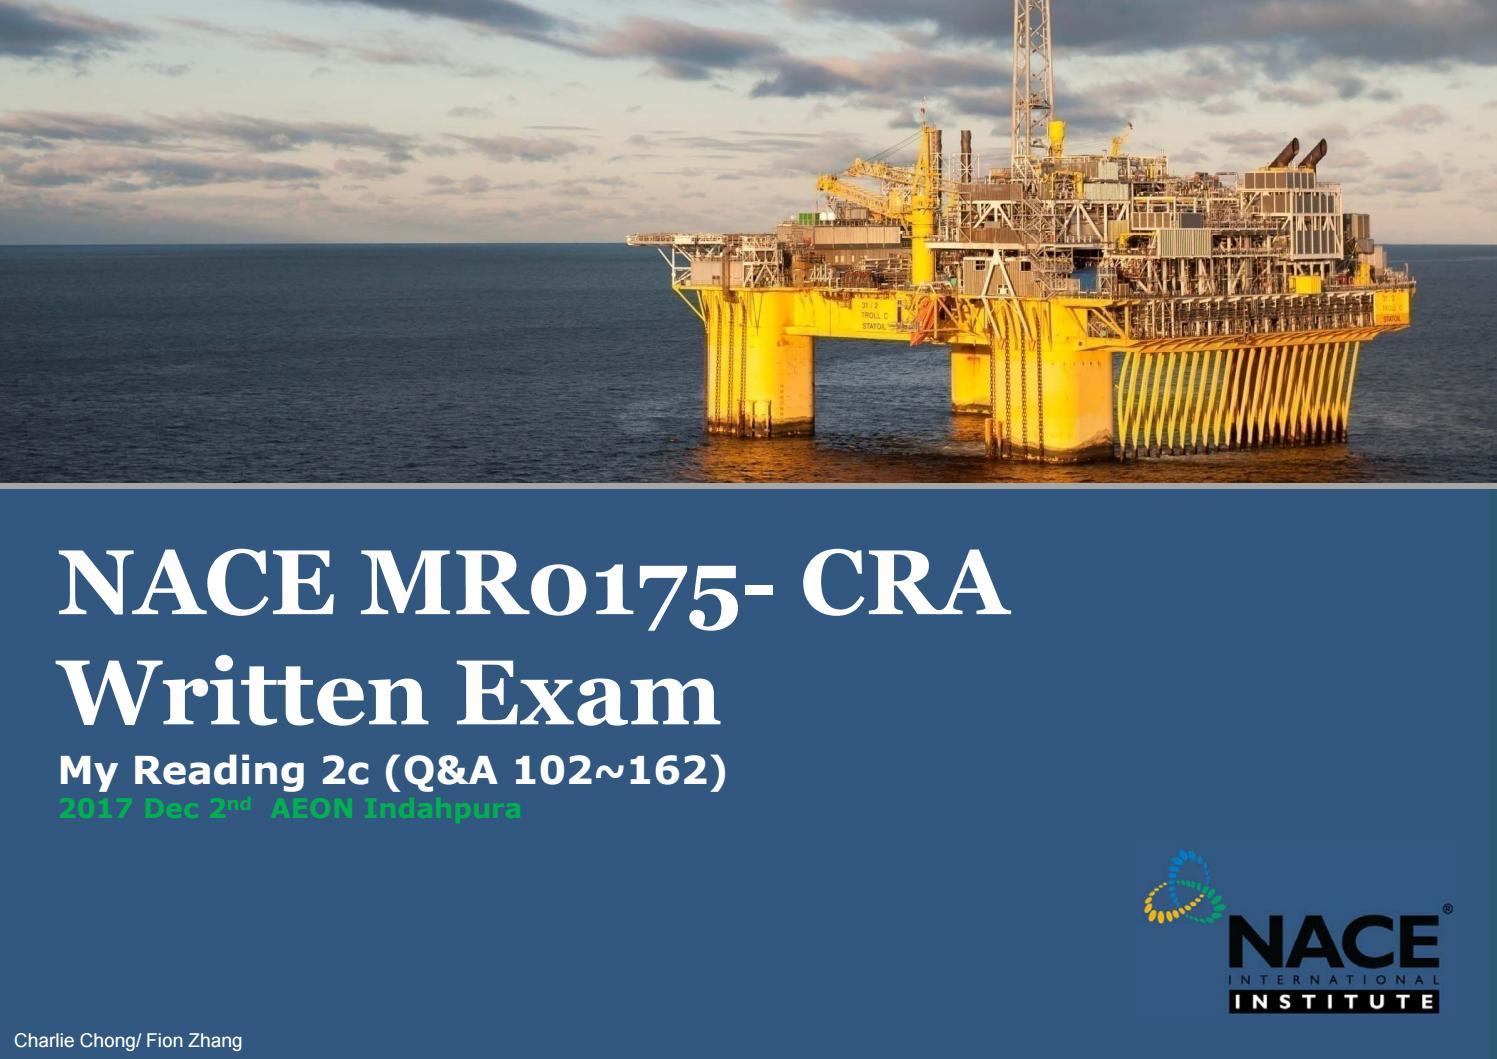 Nace mr0175 CRA Exam Note by charlie Chong - issuu